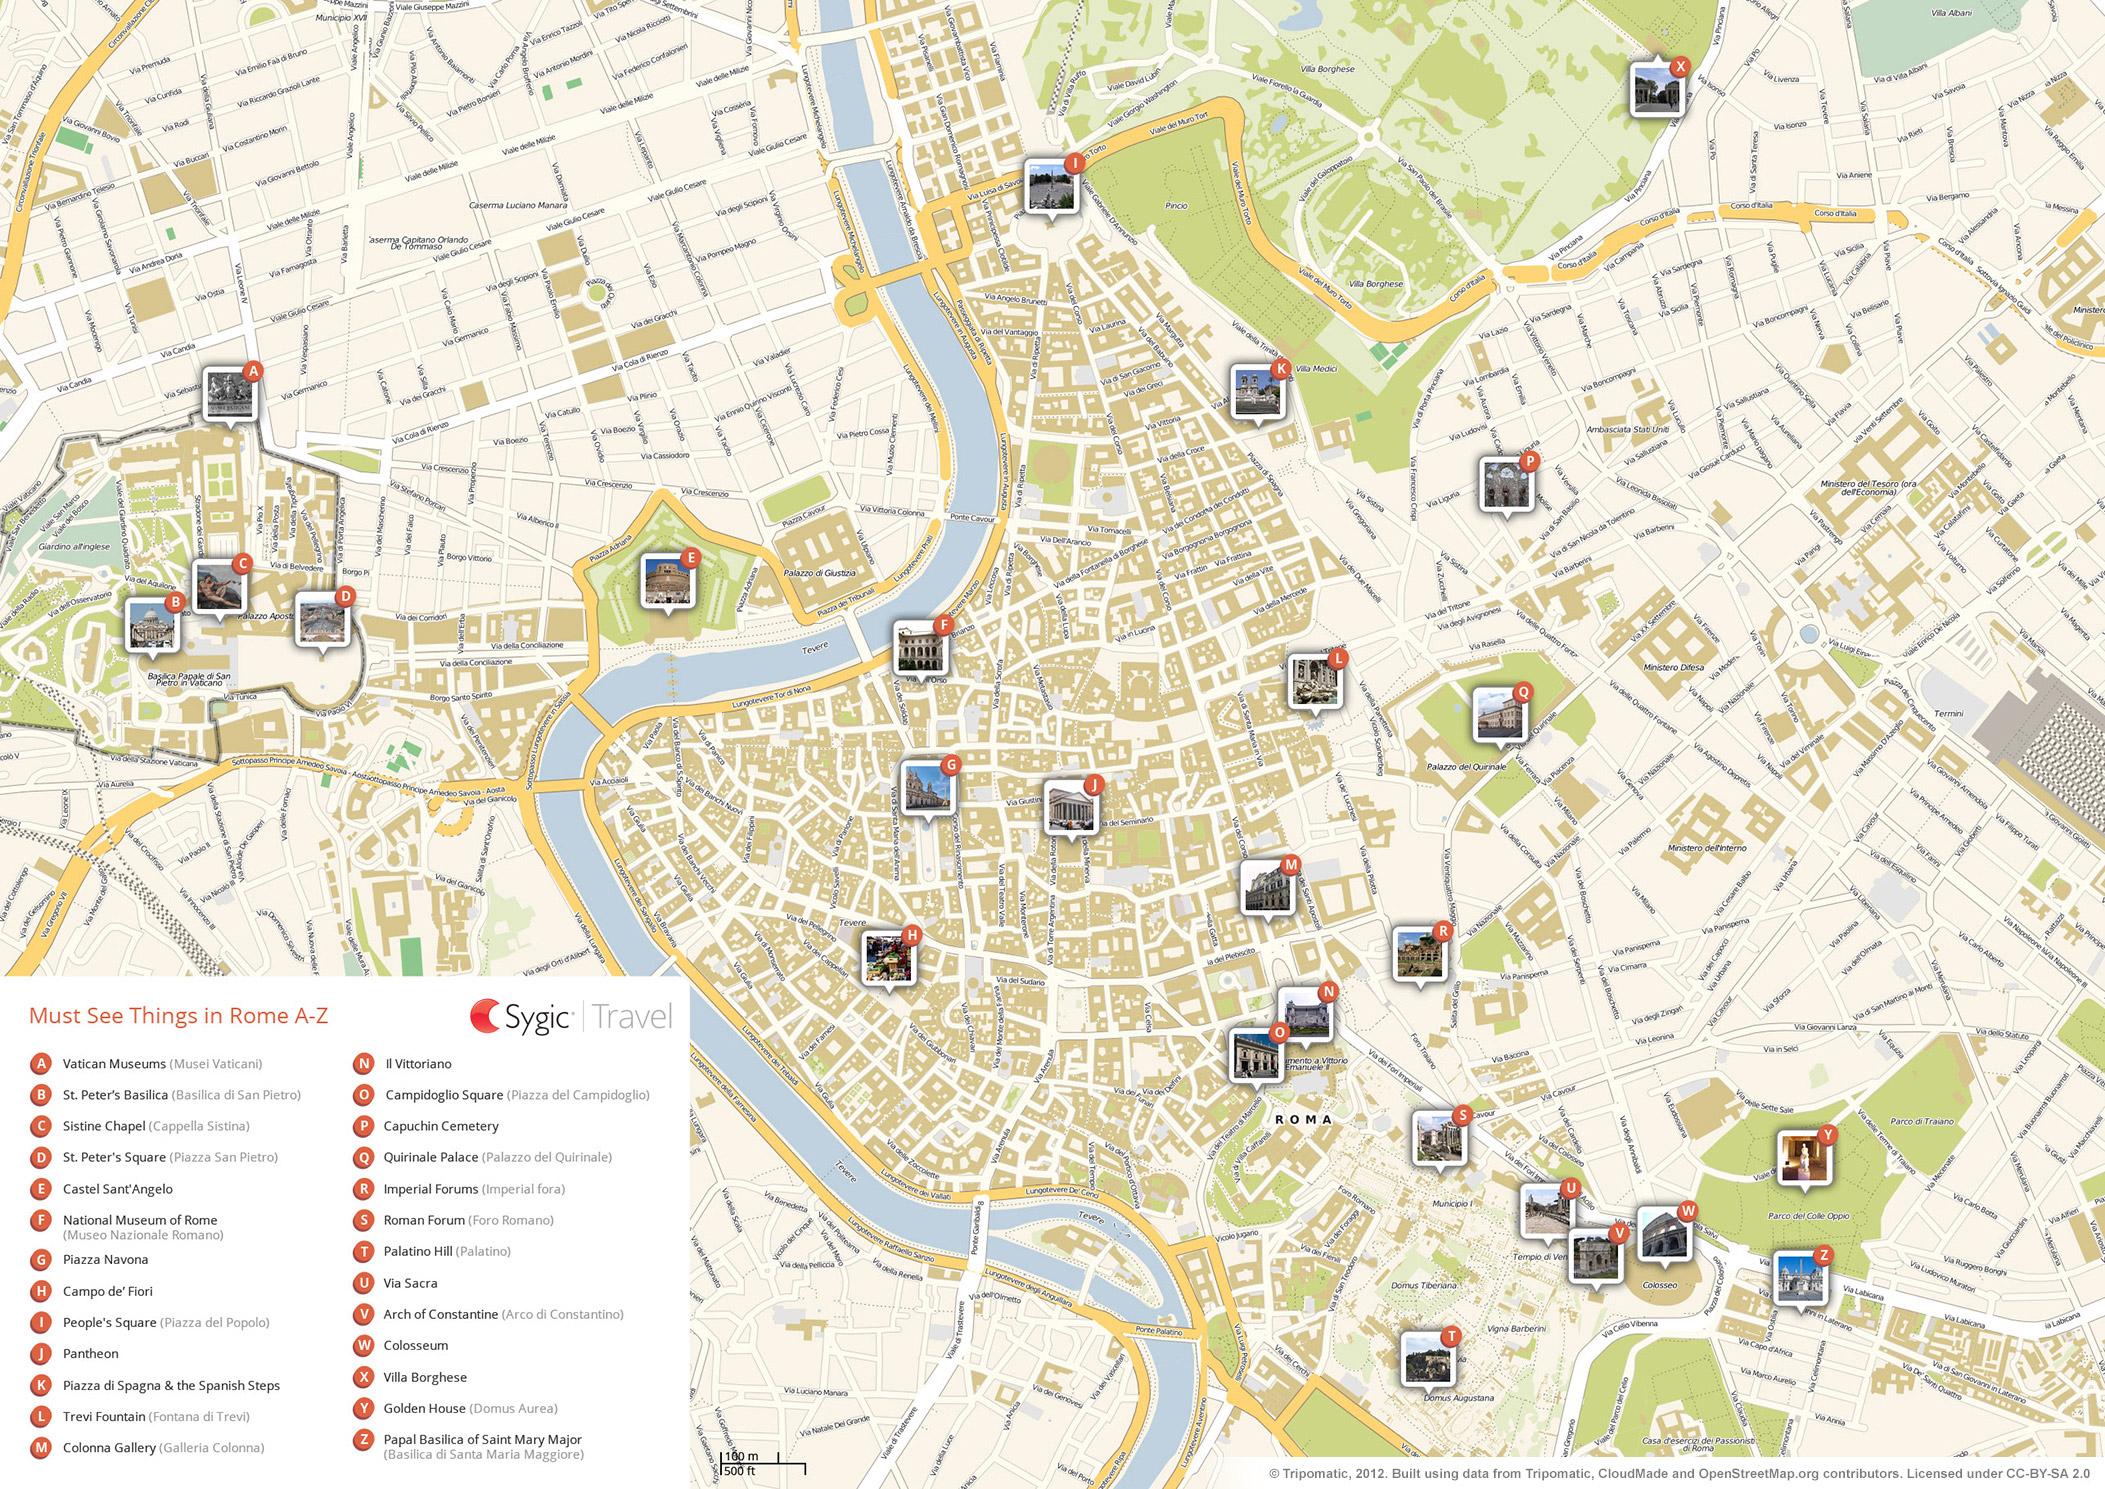 Rome Printable Tourist Map | Sygic Travel - Tourist Map Of Rome Italy Printable